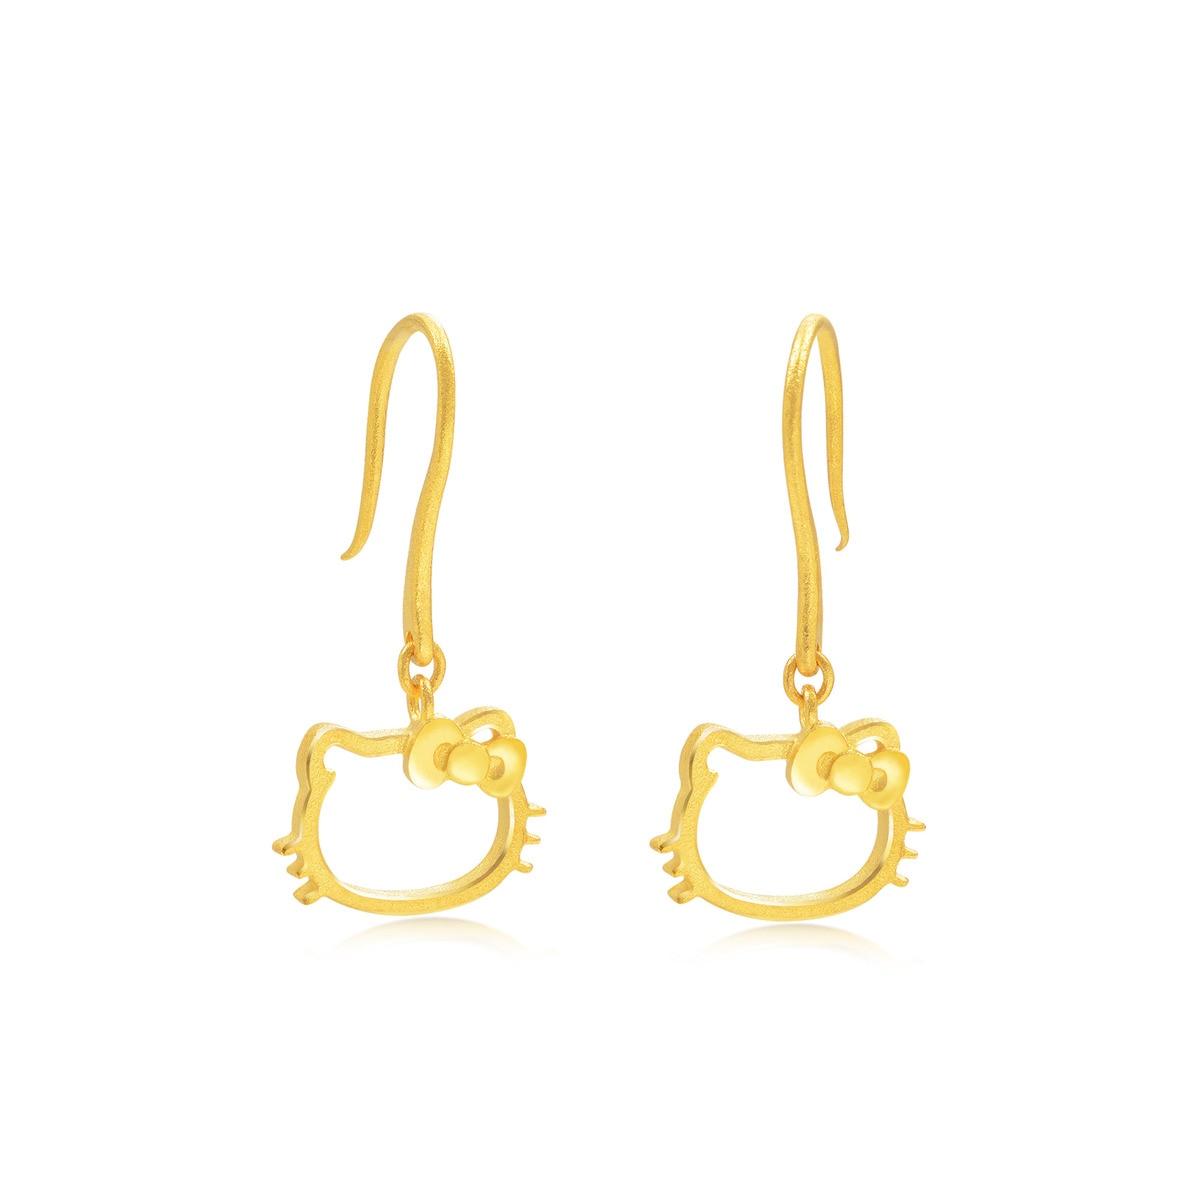 Sanrio \'Hello Kitty\' 999.9 Gold Earrings | Chow Sang Sang ...